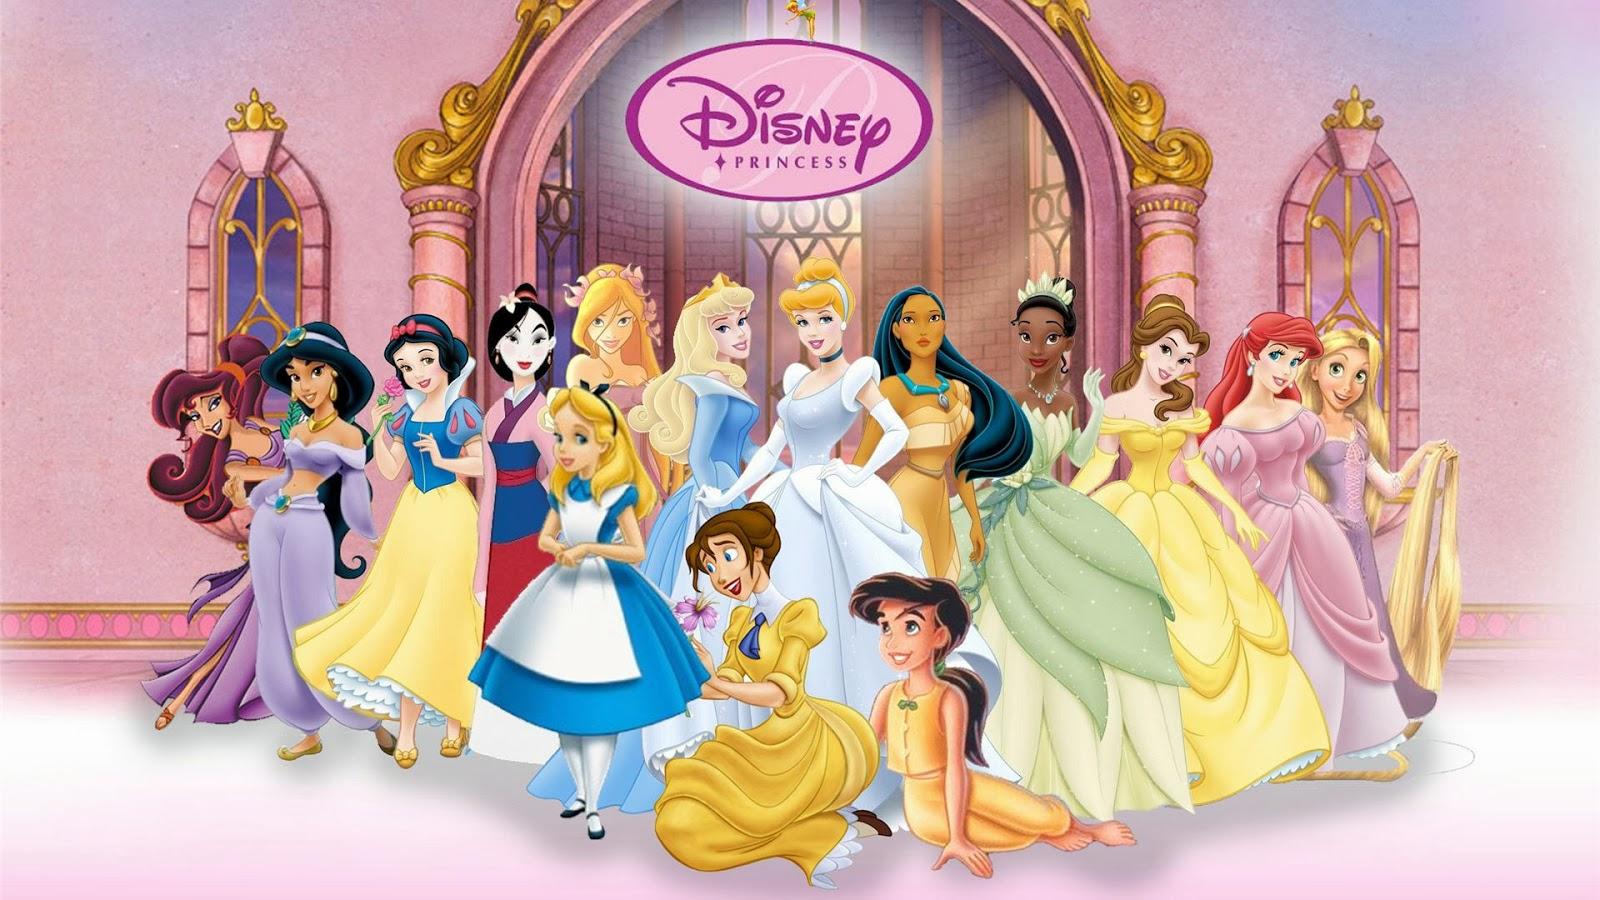 Disney Princess HD Wallpapers Download HD WALLPAERS 4U FREE 1600x900